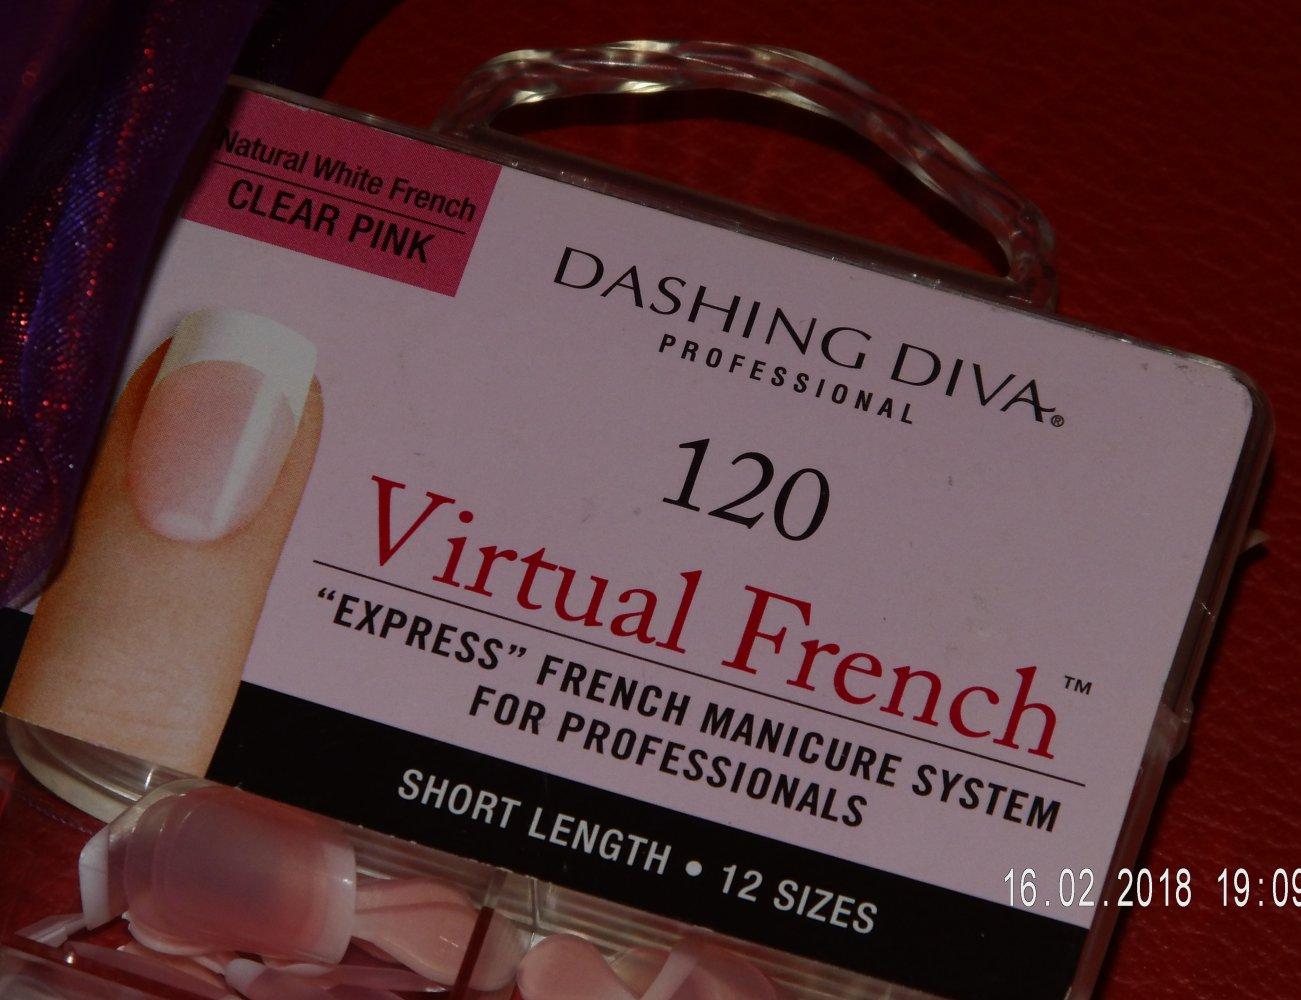 Dashing Diva 120 Virtual French Nails 100Stk. Natural White French ...